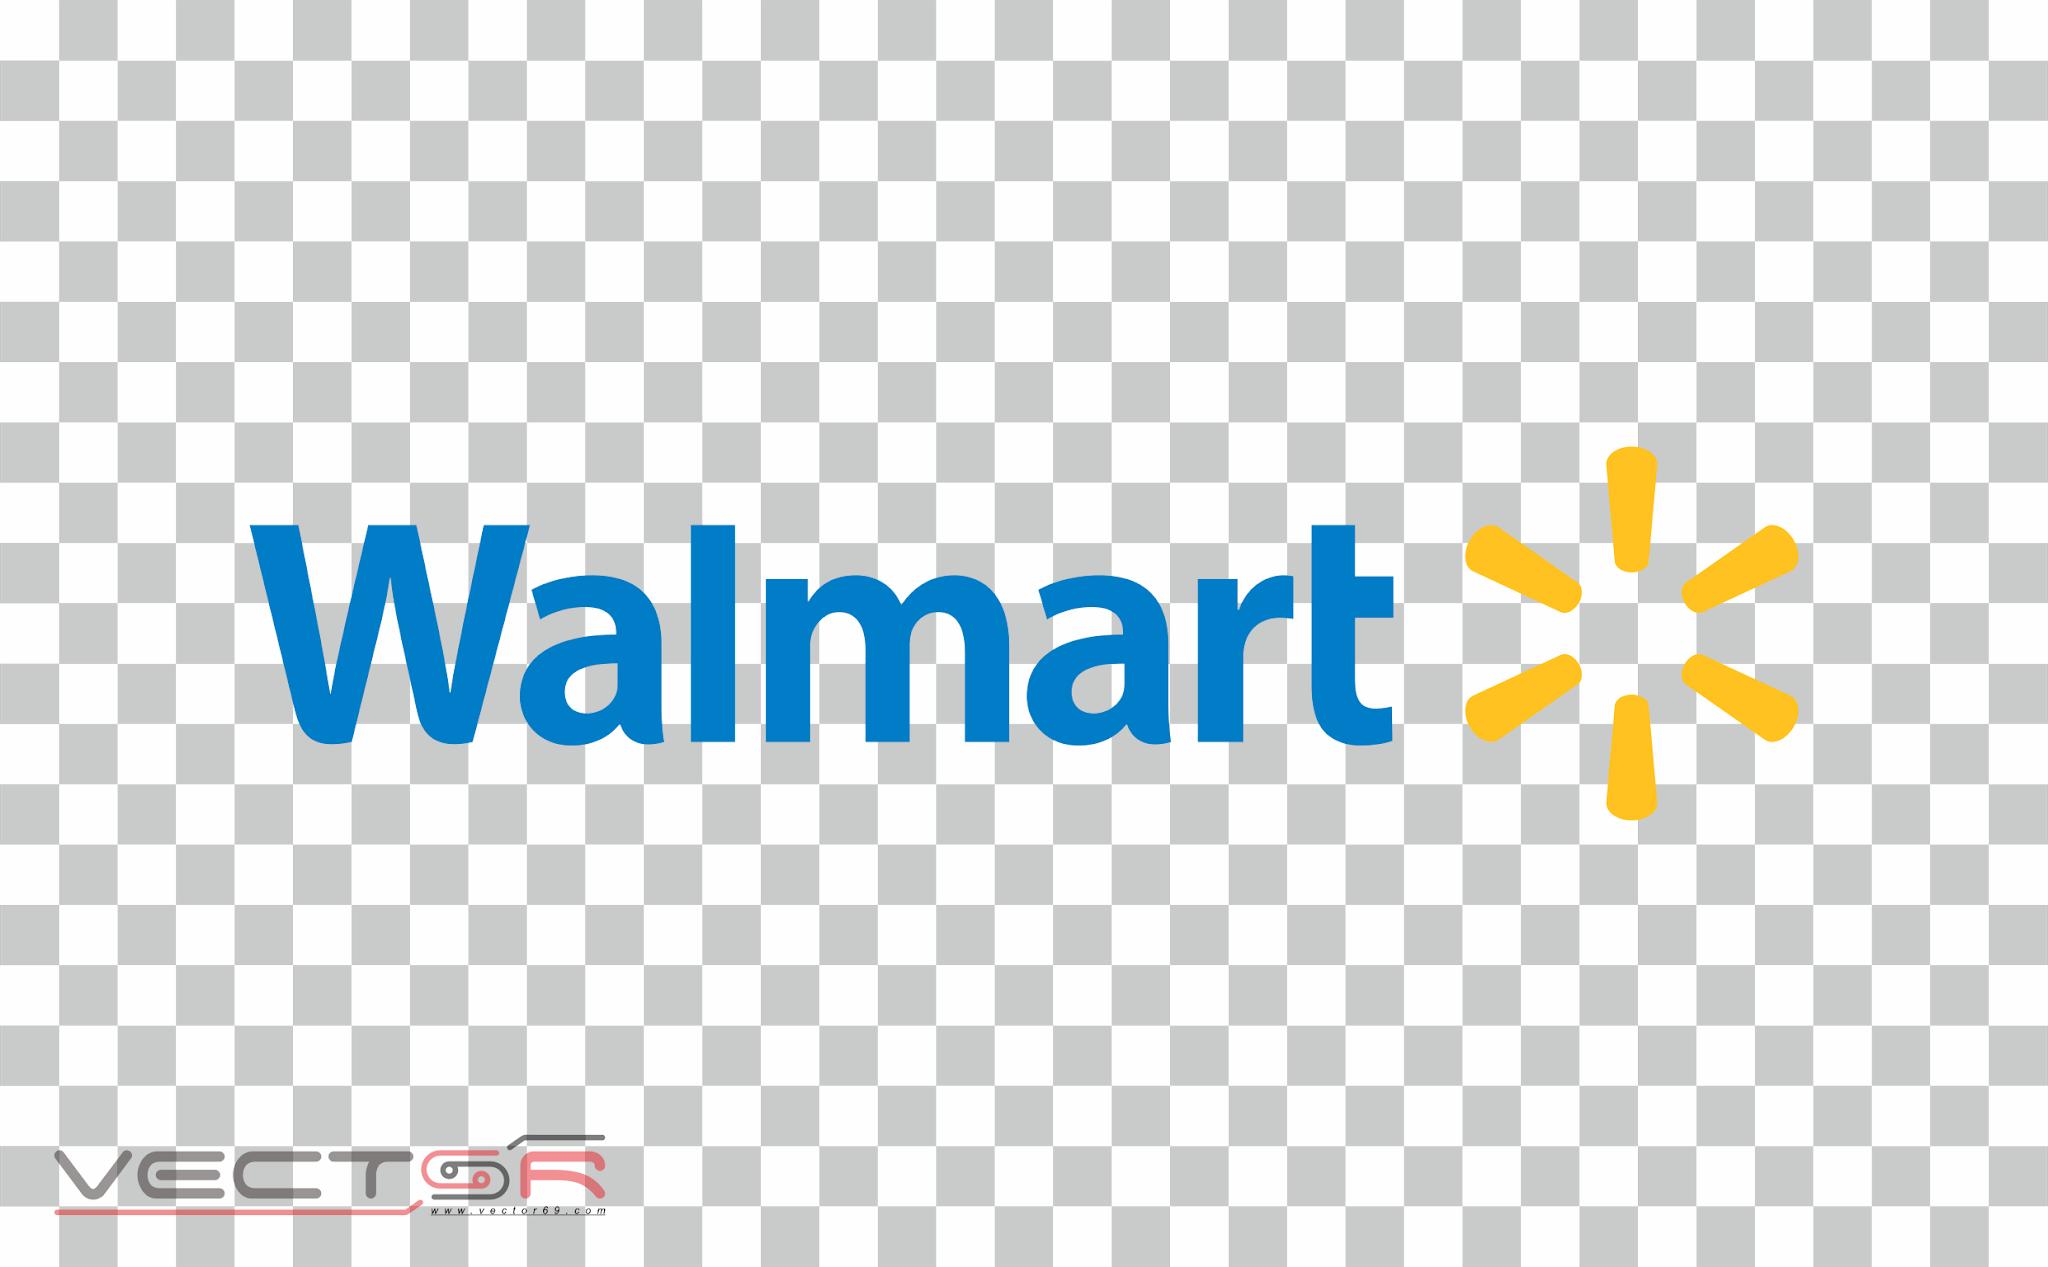 Walmart Logo - Download Vector File PNG (Portable Network Graphics)